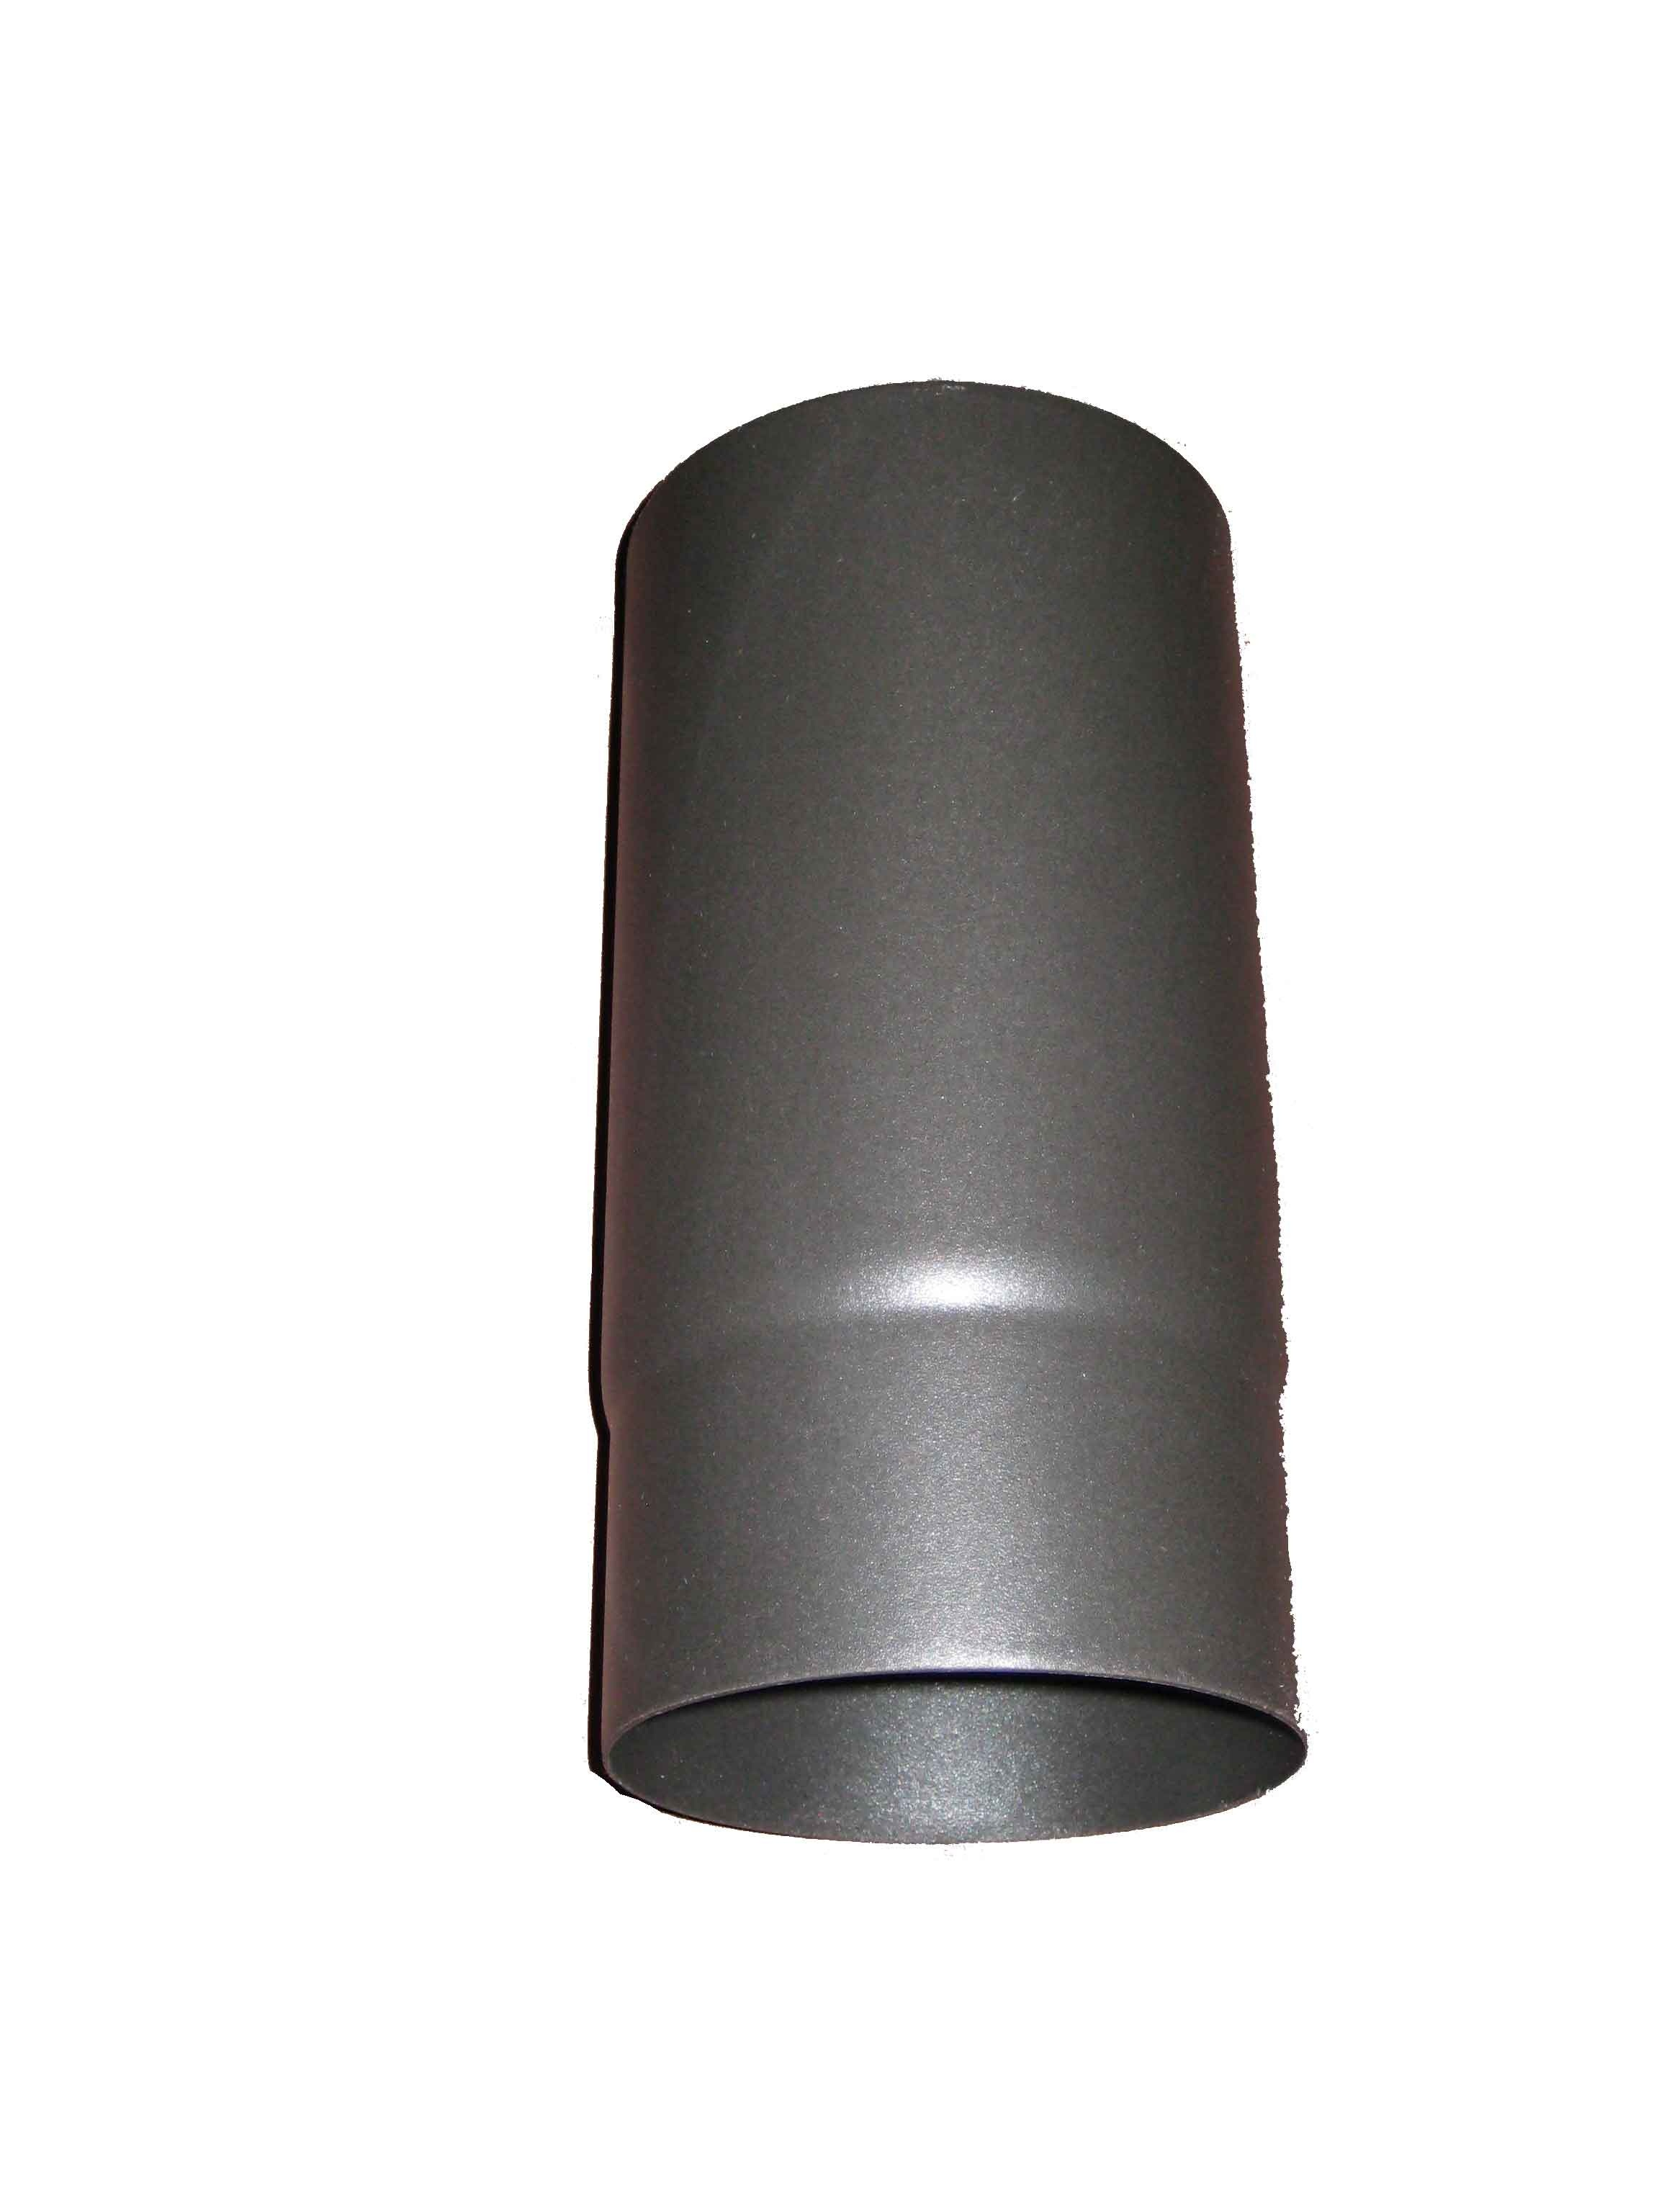 "Matt Black Enamel 250mm Straight MBE Pipe 6"""